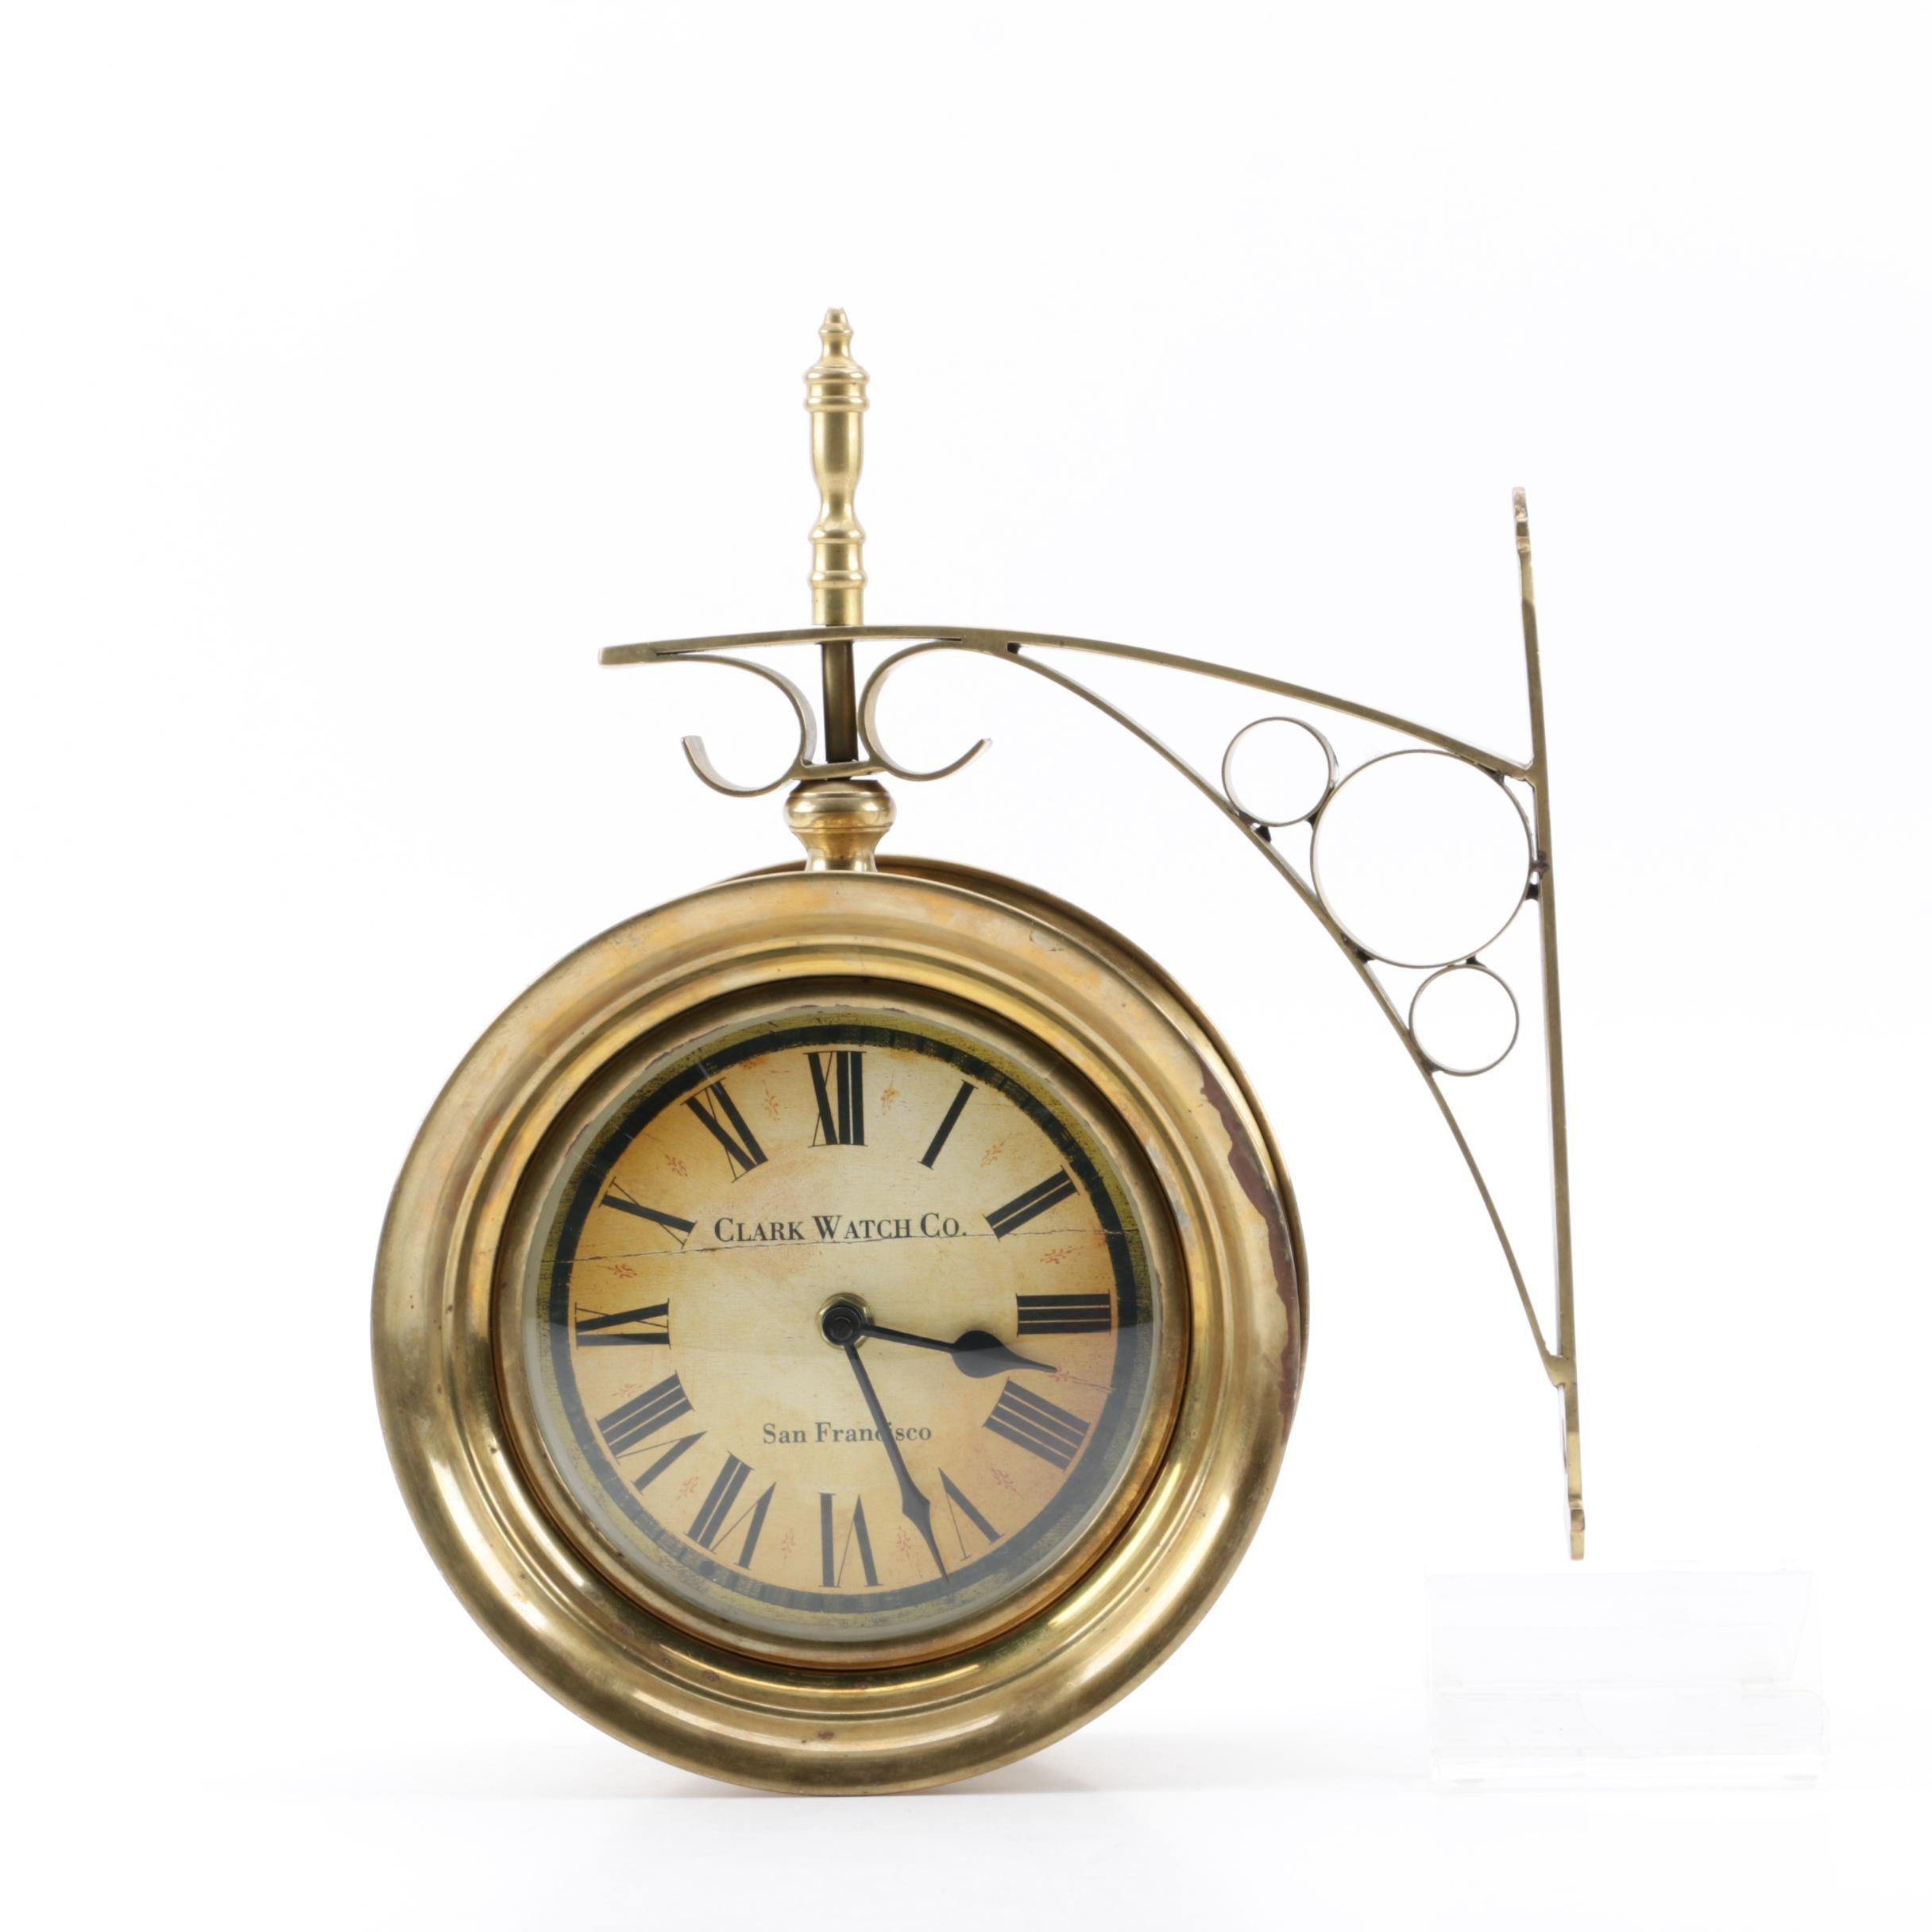 Clark Watch Co. Double Sided Wall Clock